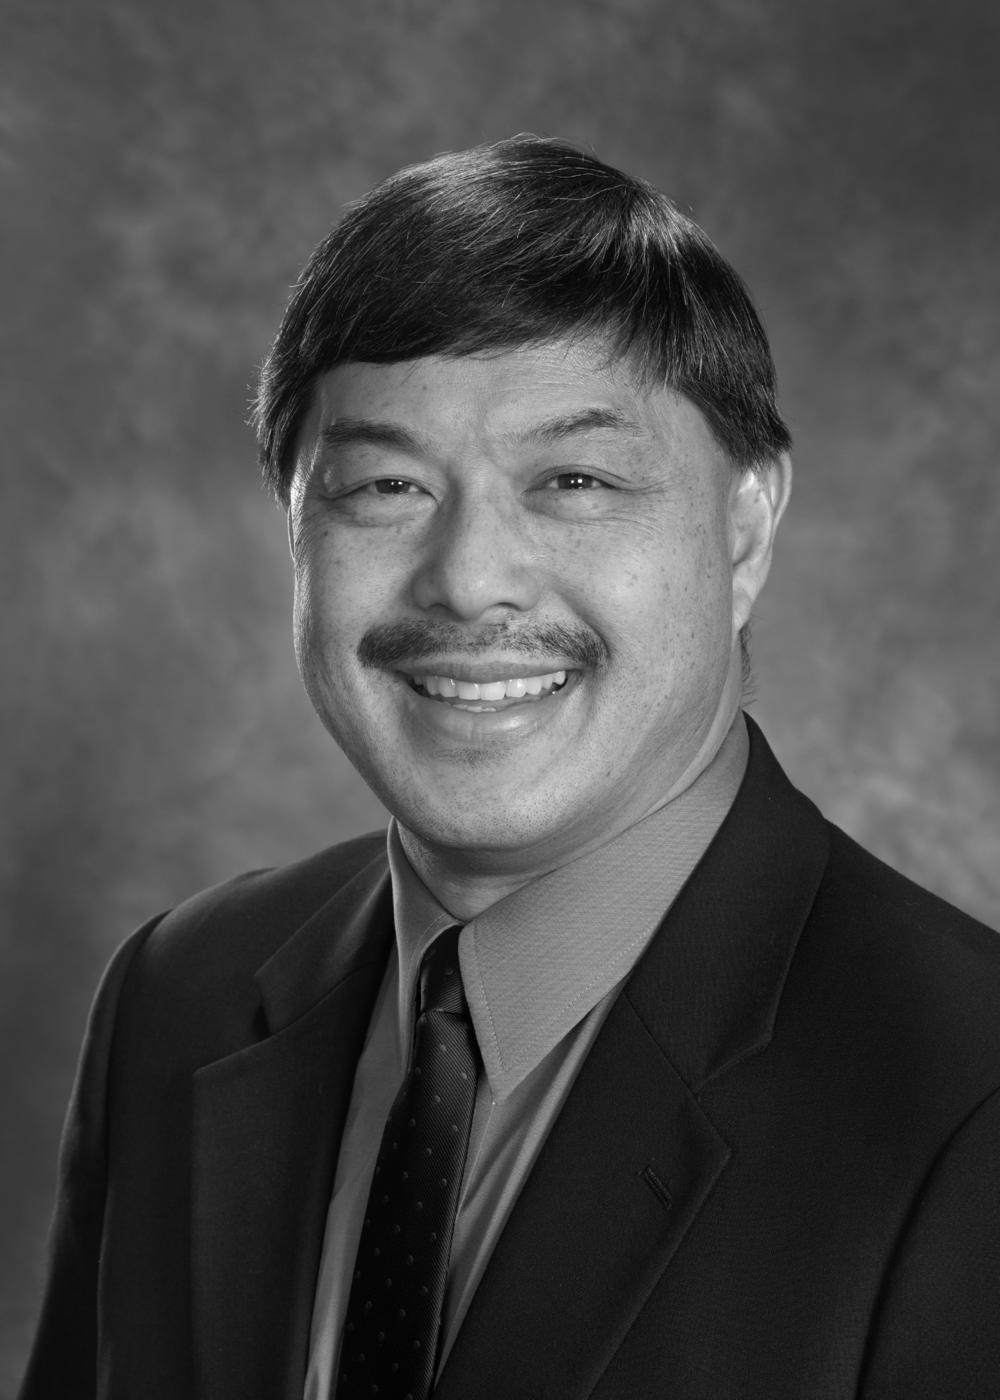 Ronald Yee, MD, MBA, FAAFP - Strategic Advisor